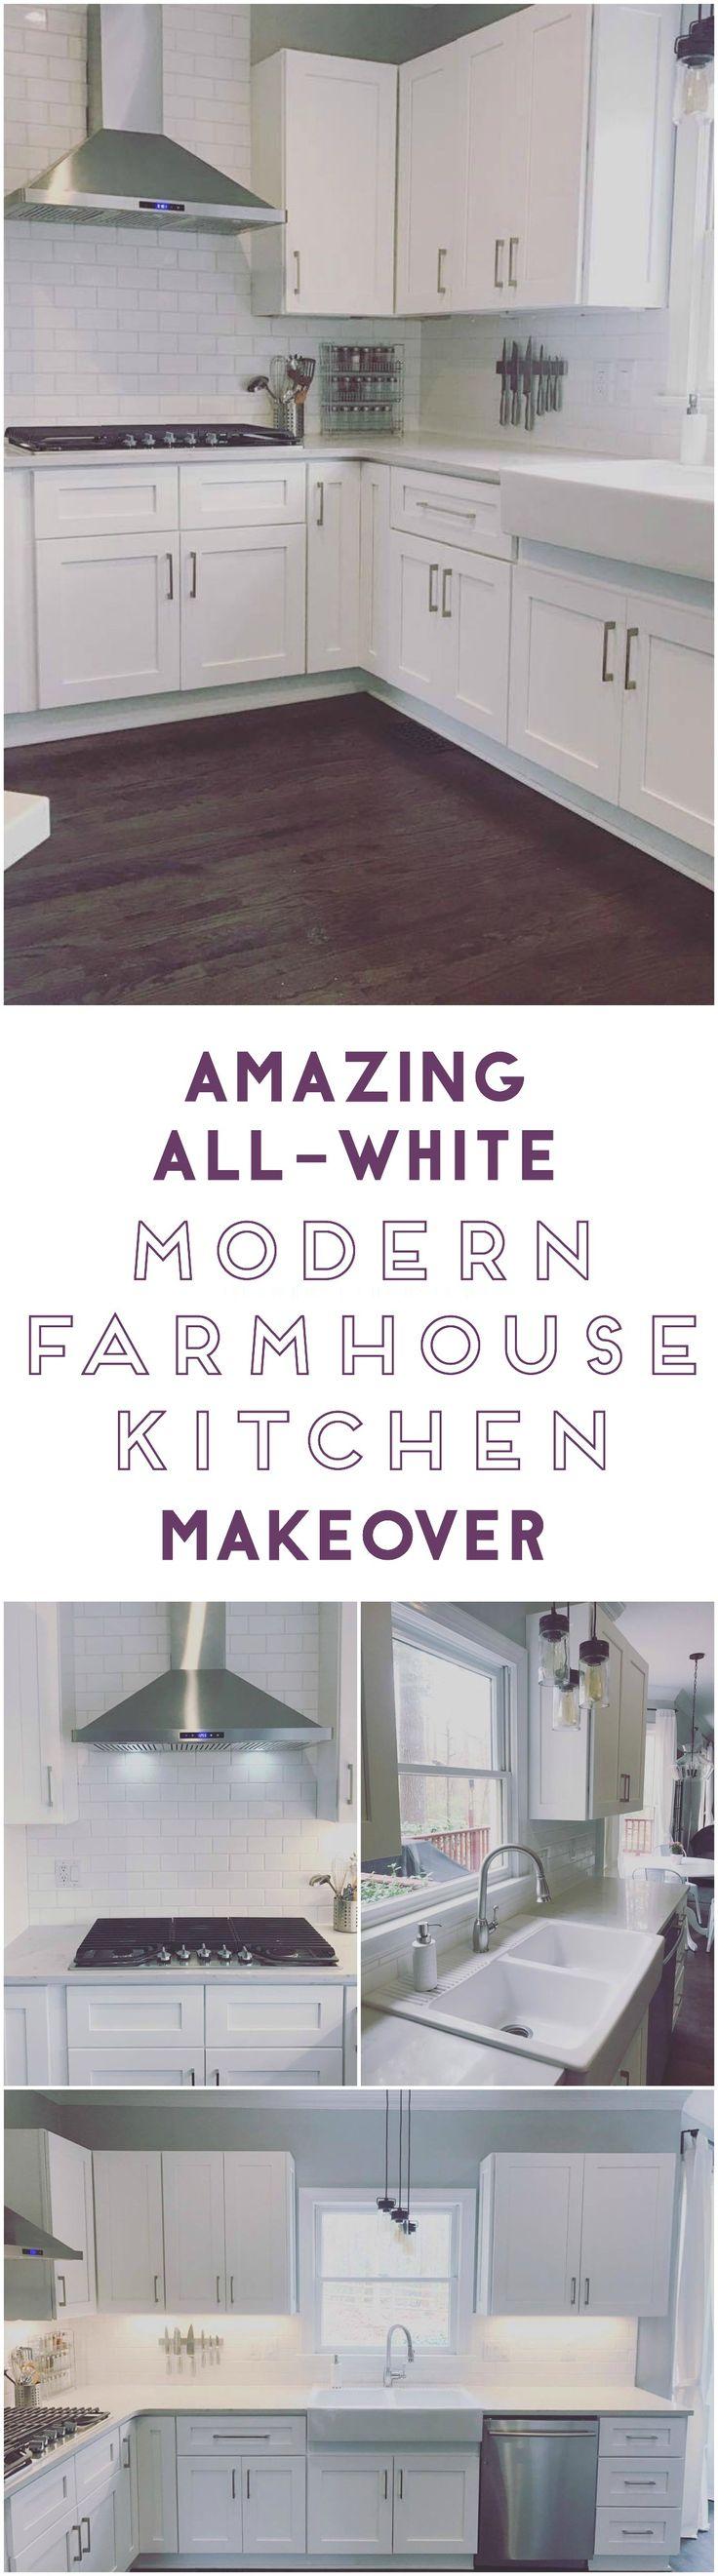 all white modern farmhouse kitchen makeover